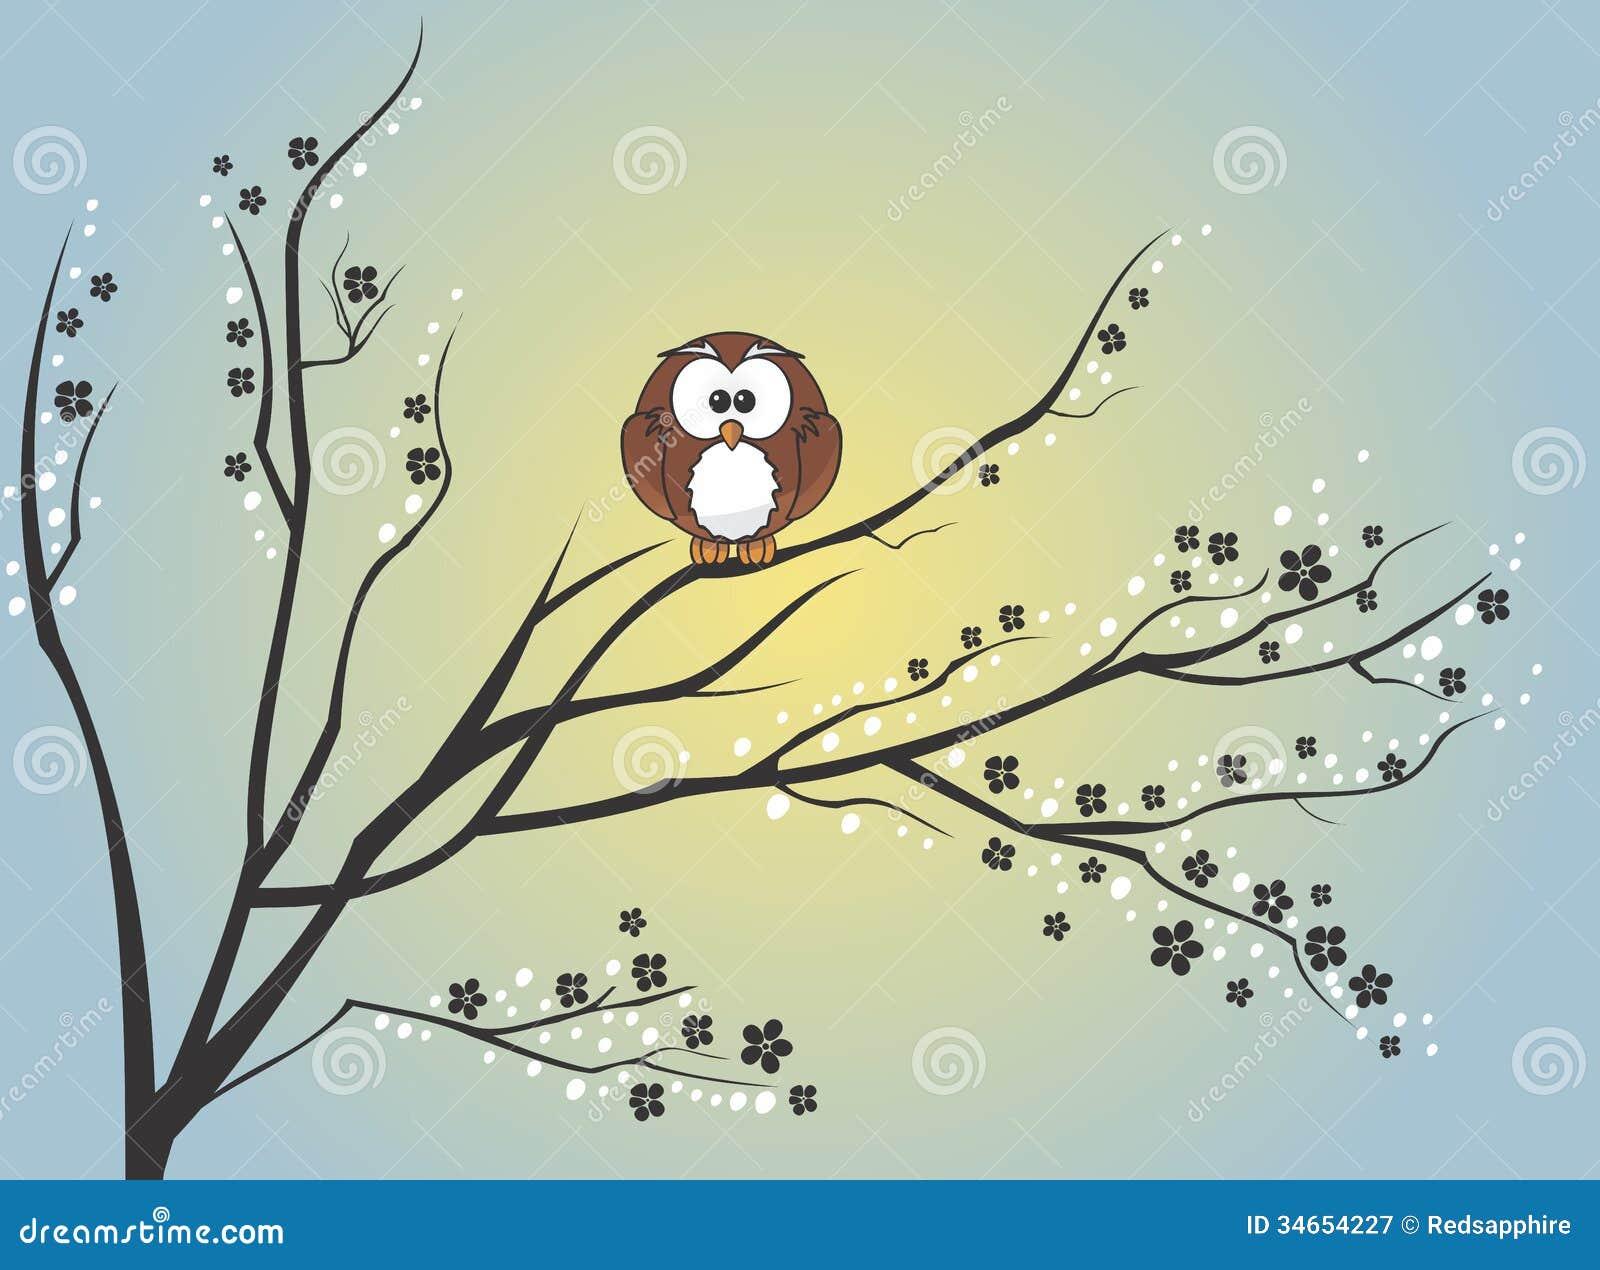 Owl Cartoon In Tree